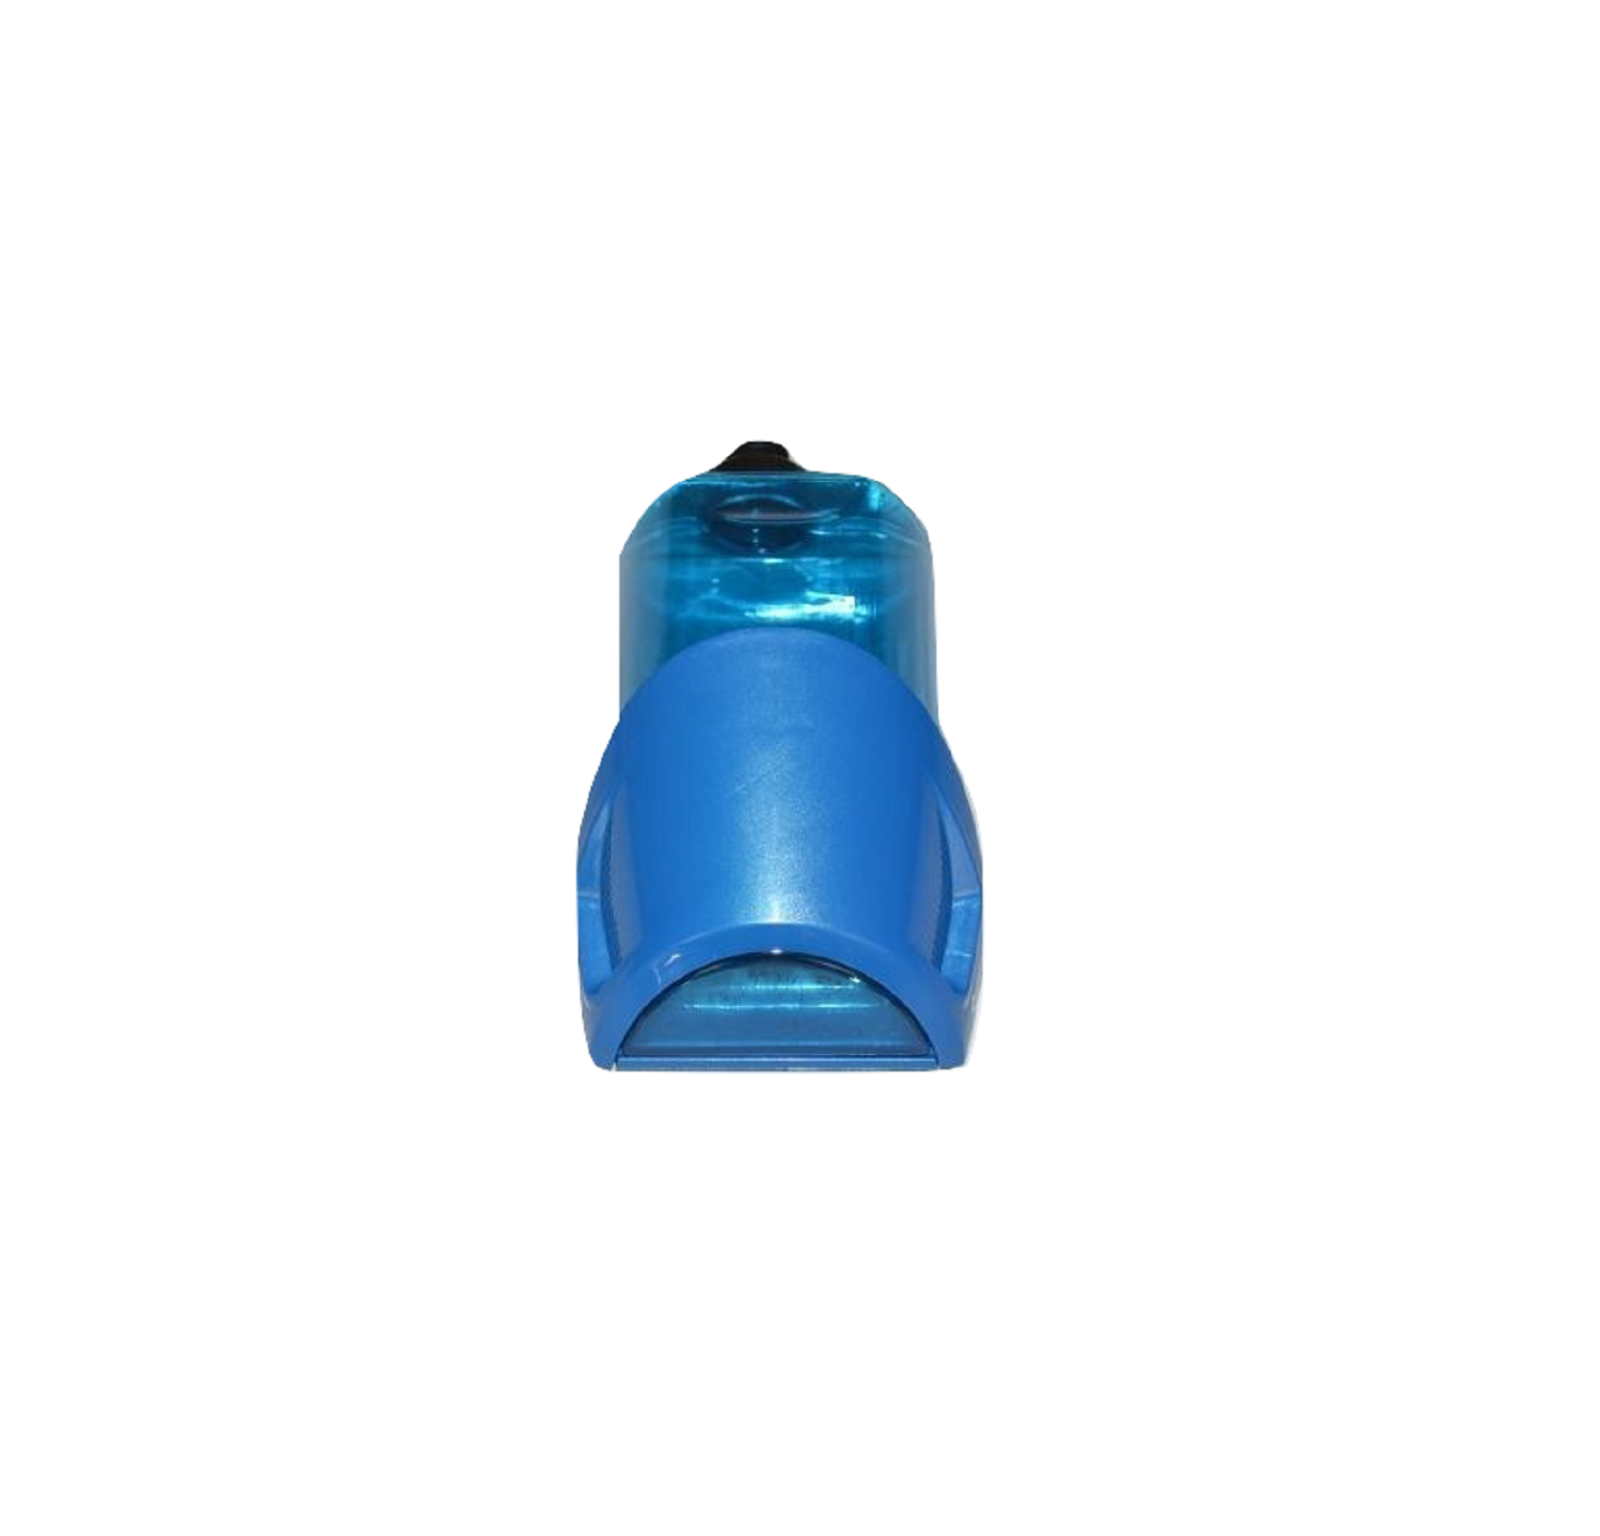 Bissell Powerfresh Steam Mop Water Tank With Cap Amp Insert